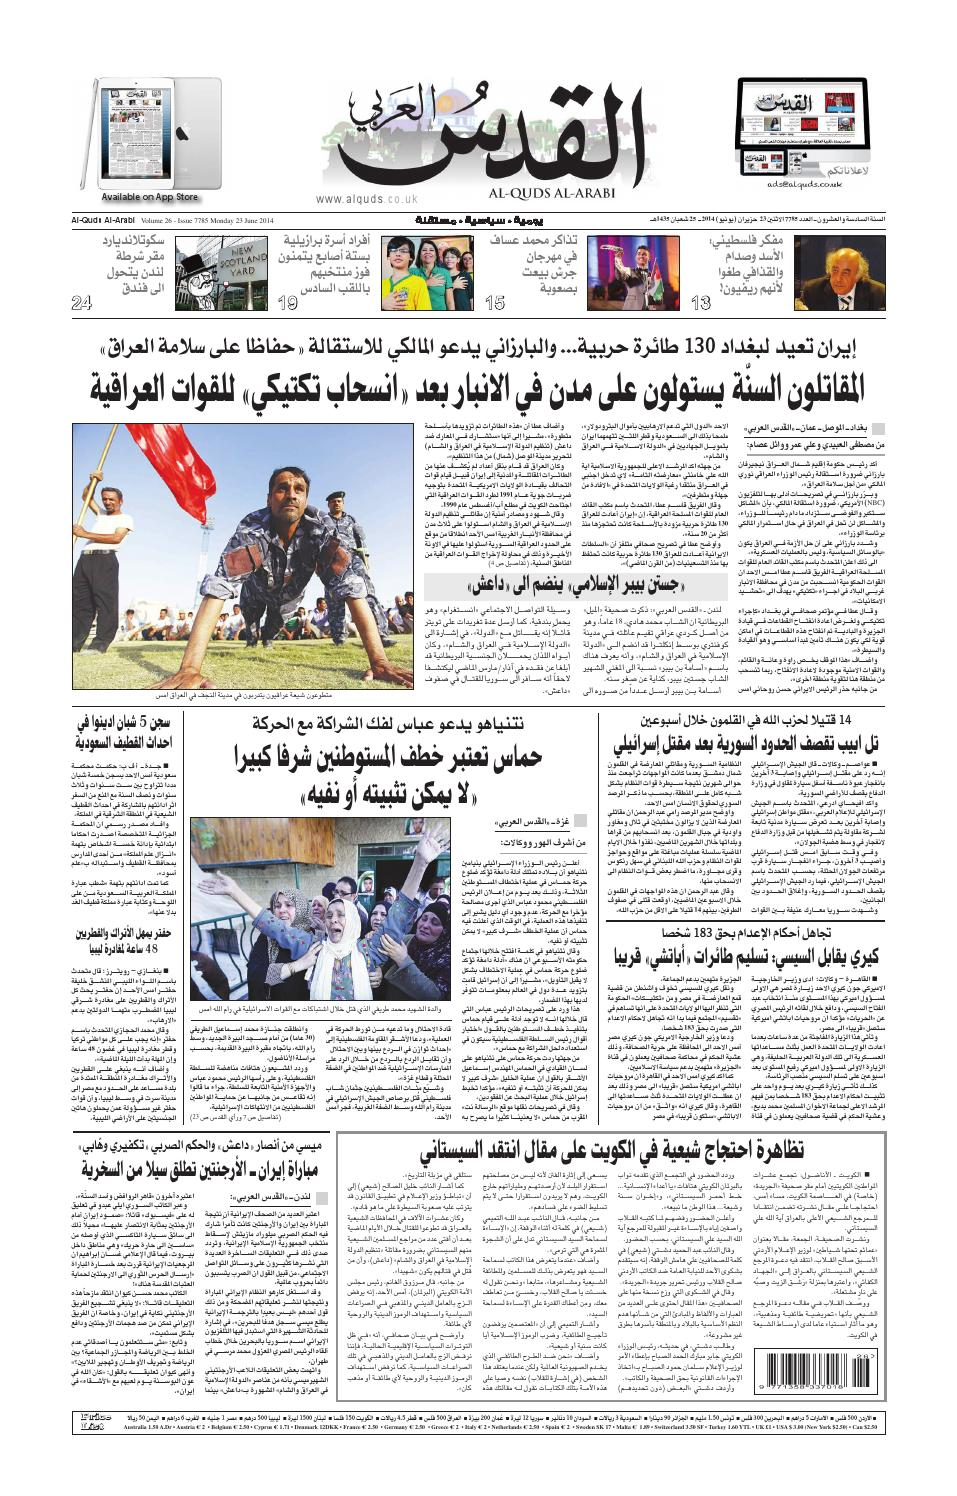 63469b54a صحيفة القدس العربي , الإثنين 23.06.2014 by مركز الحدث - issuu